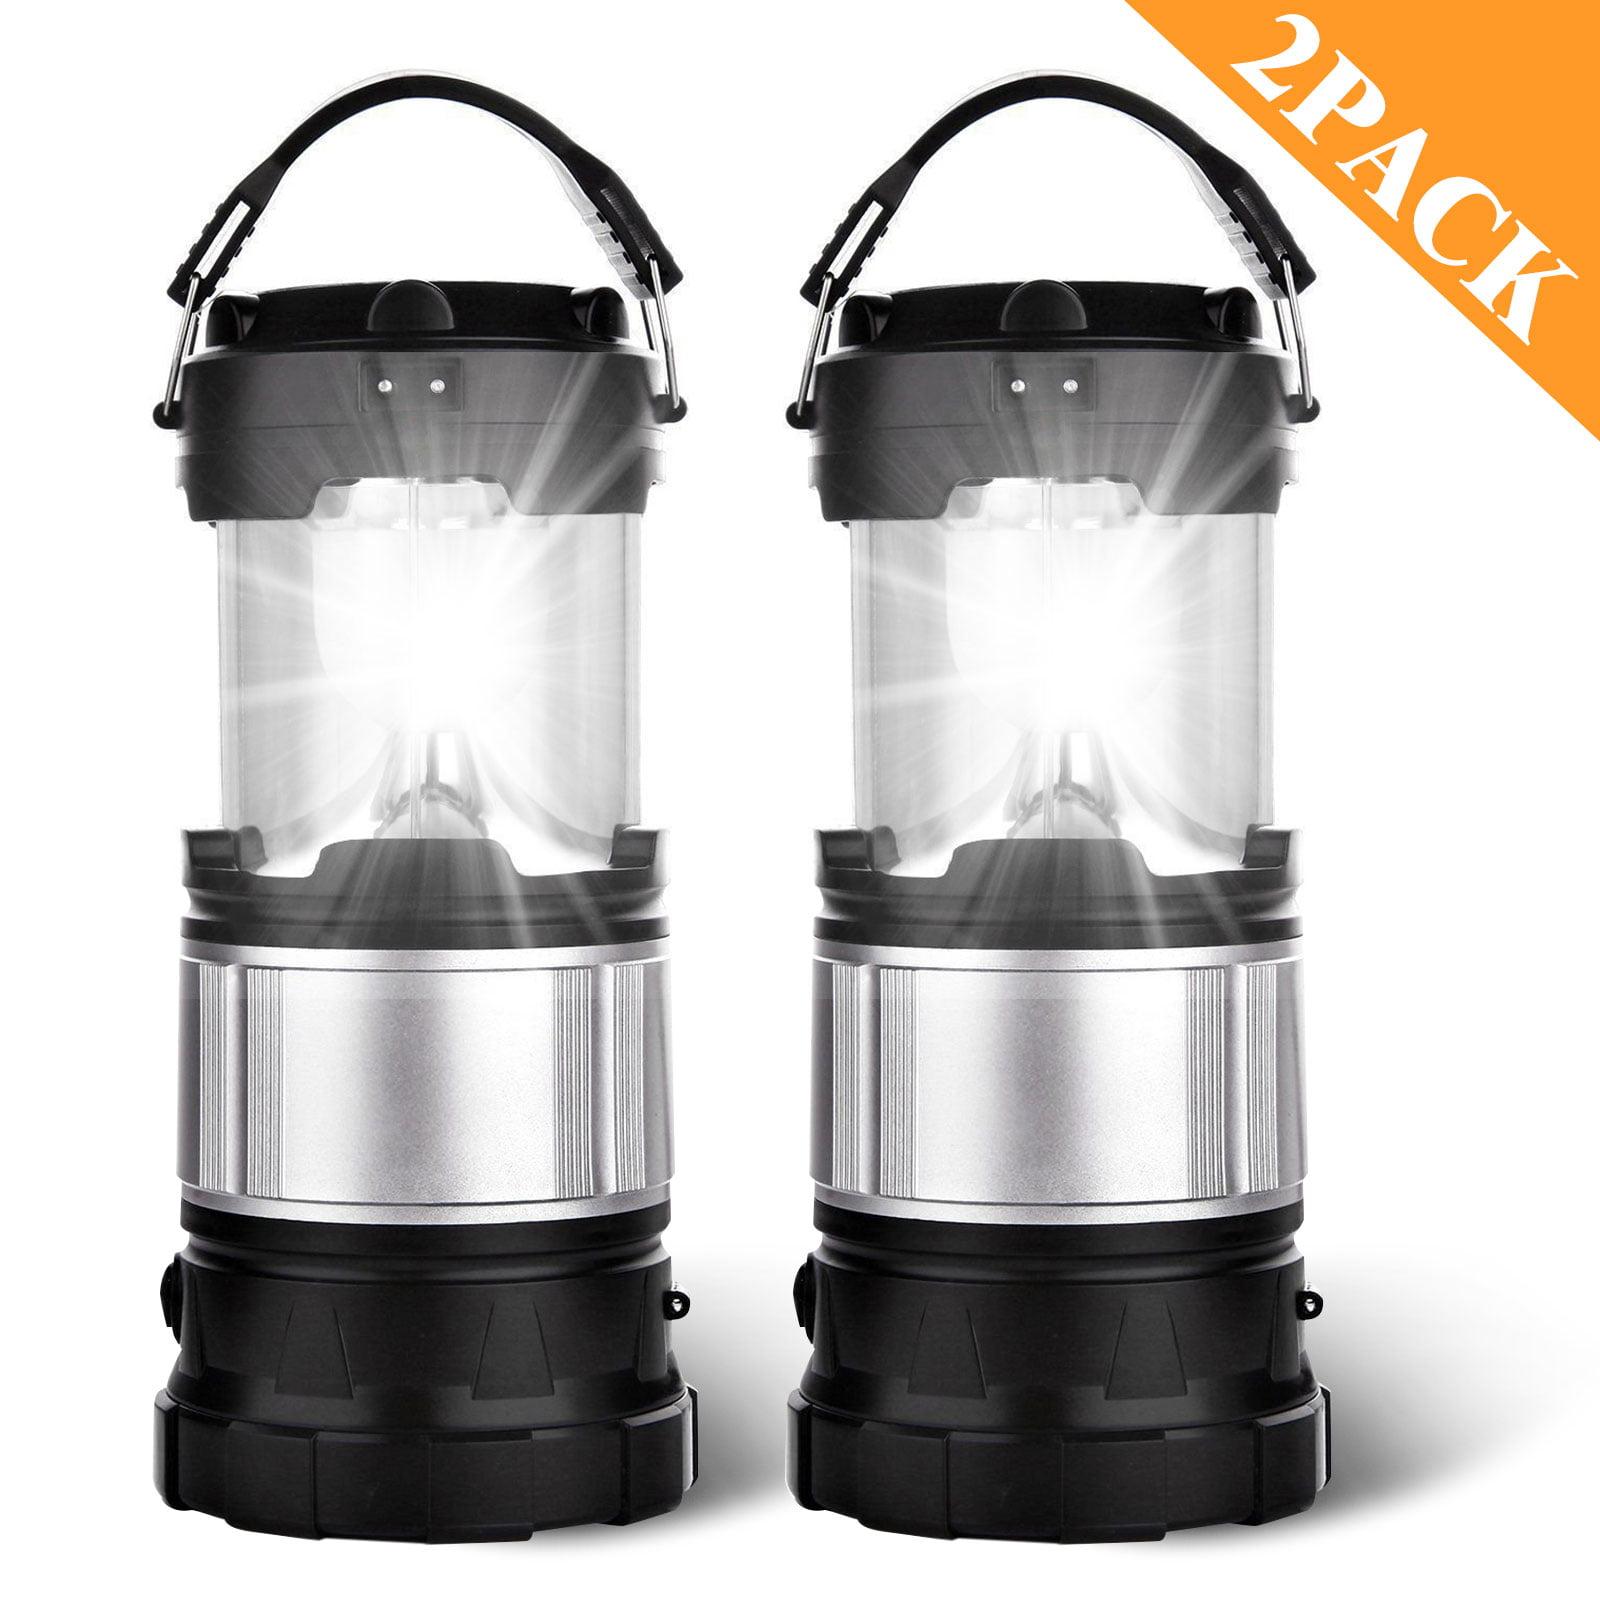 Mini Wind Up Torch Lamp LED Solar Power Light Outdoor Camping Flashlight